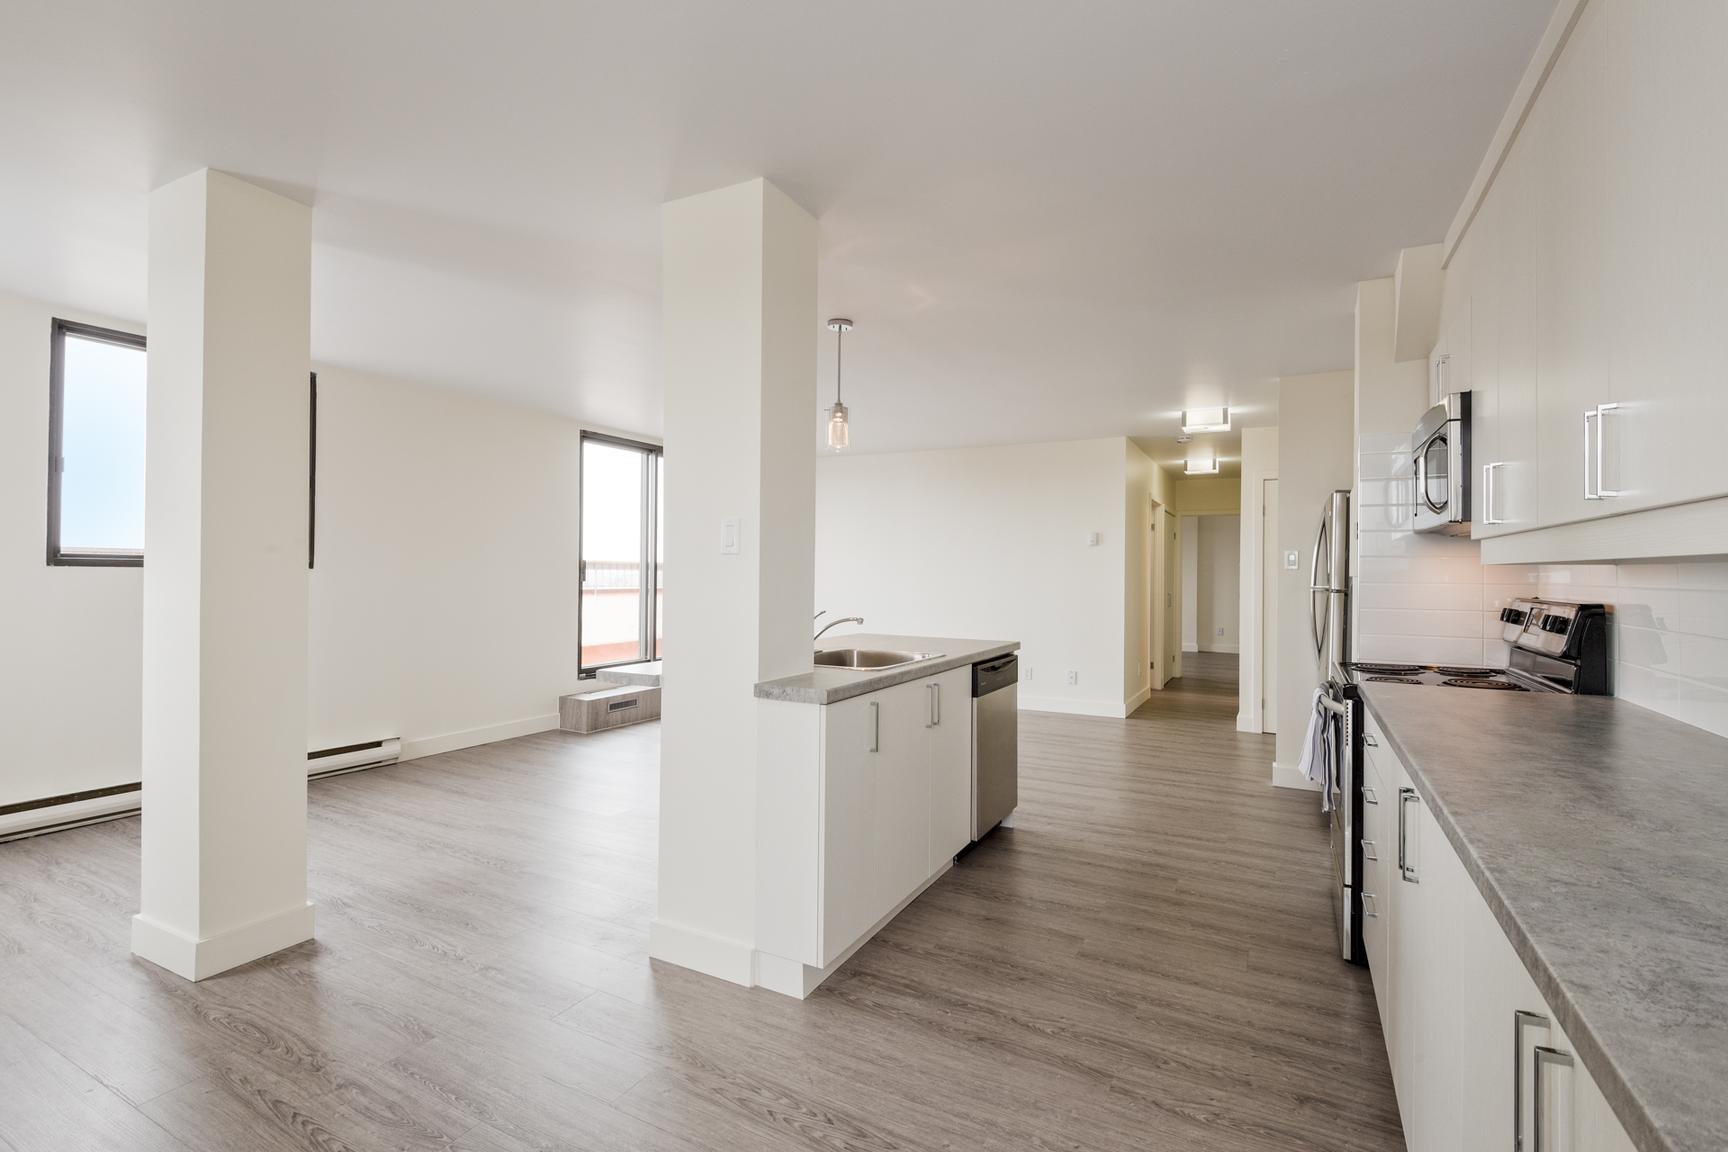 1 bedroom Apartments for rent in Laval at Le Quatre Cent - Photo 15 - RentQuebecApartments – L407184